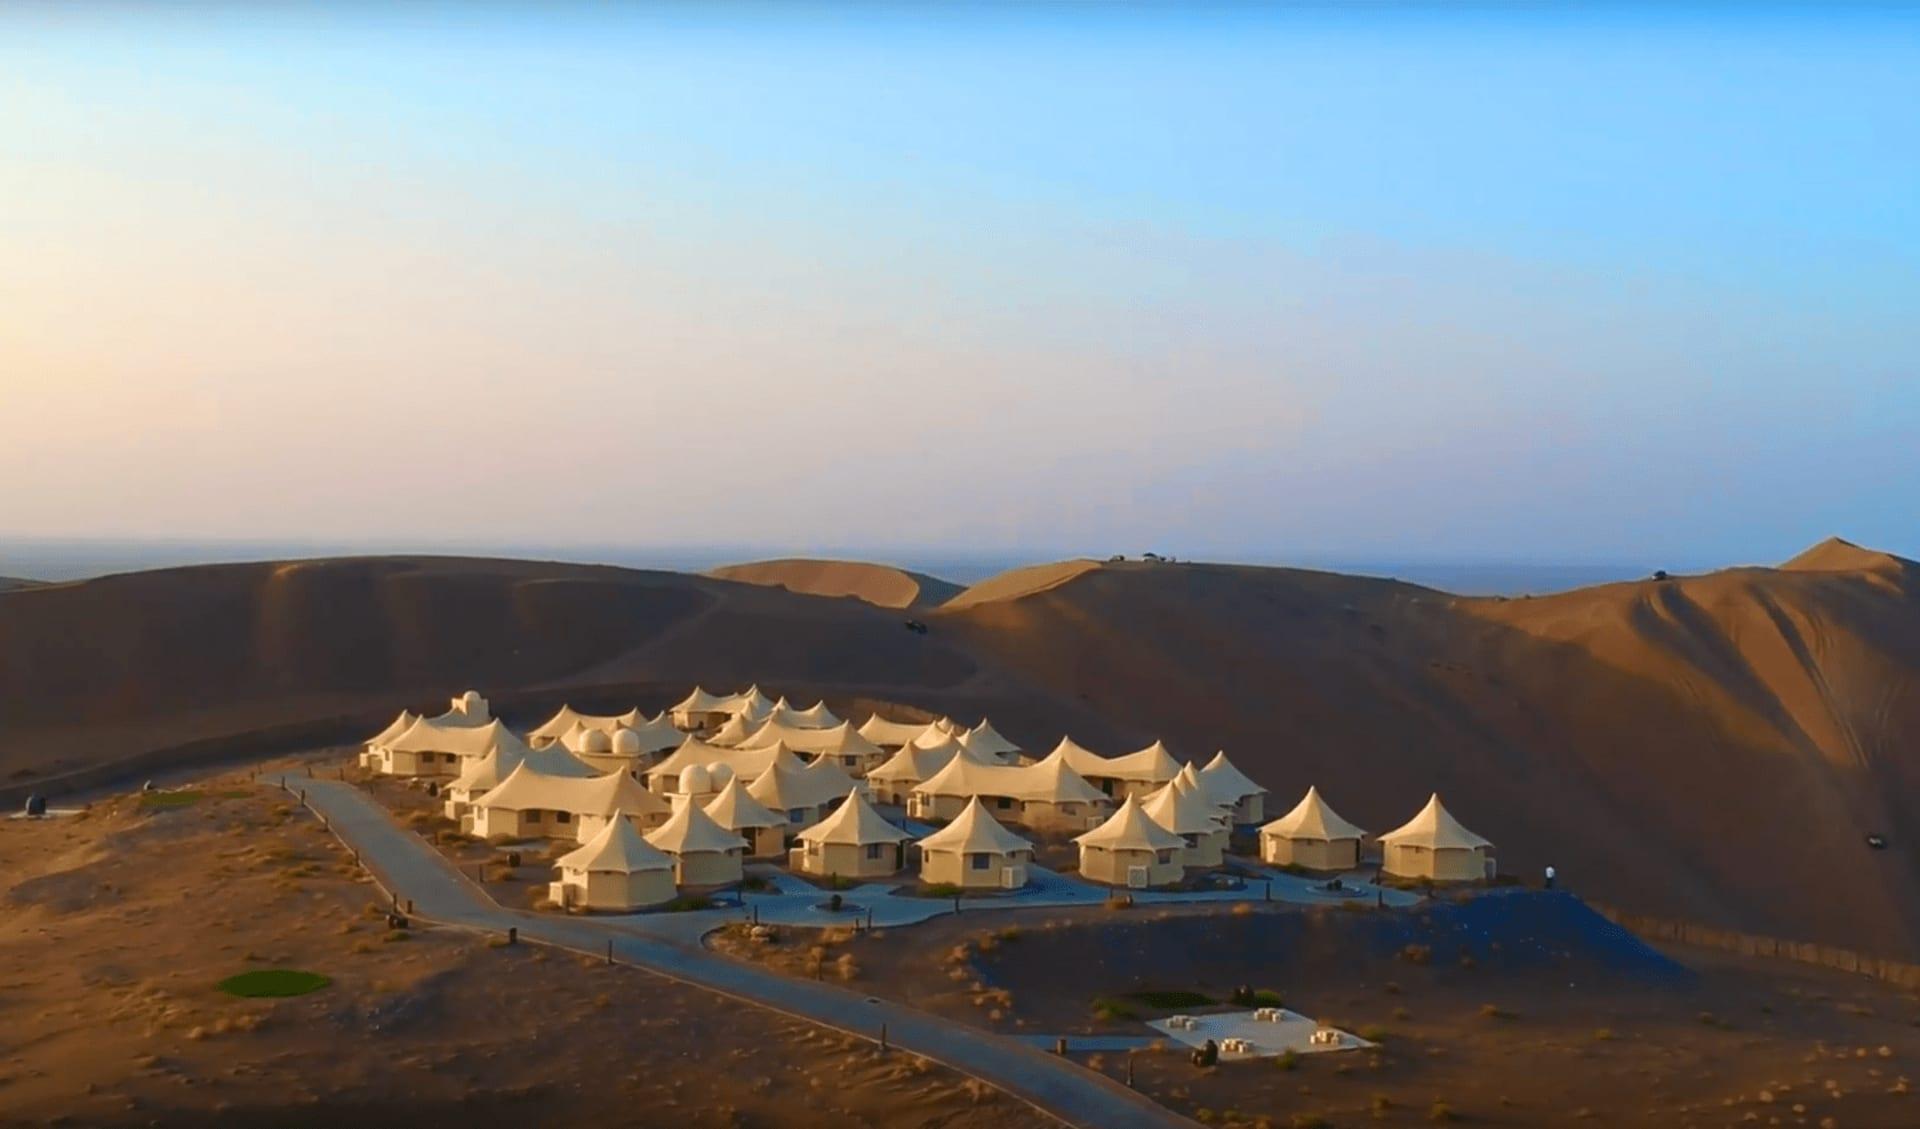 Dunes by Al Nahda in Barka: